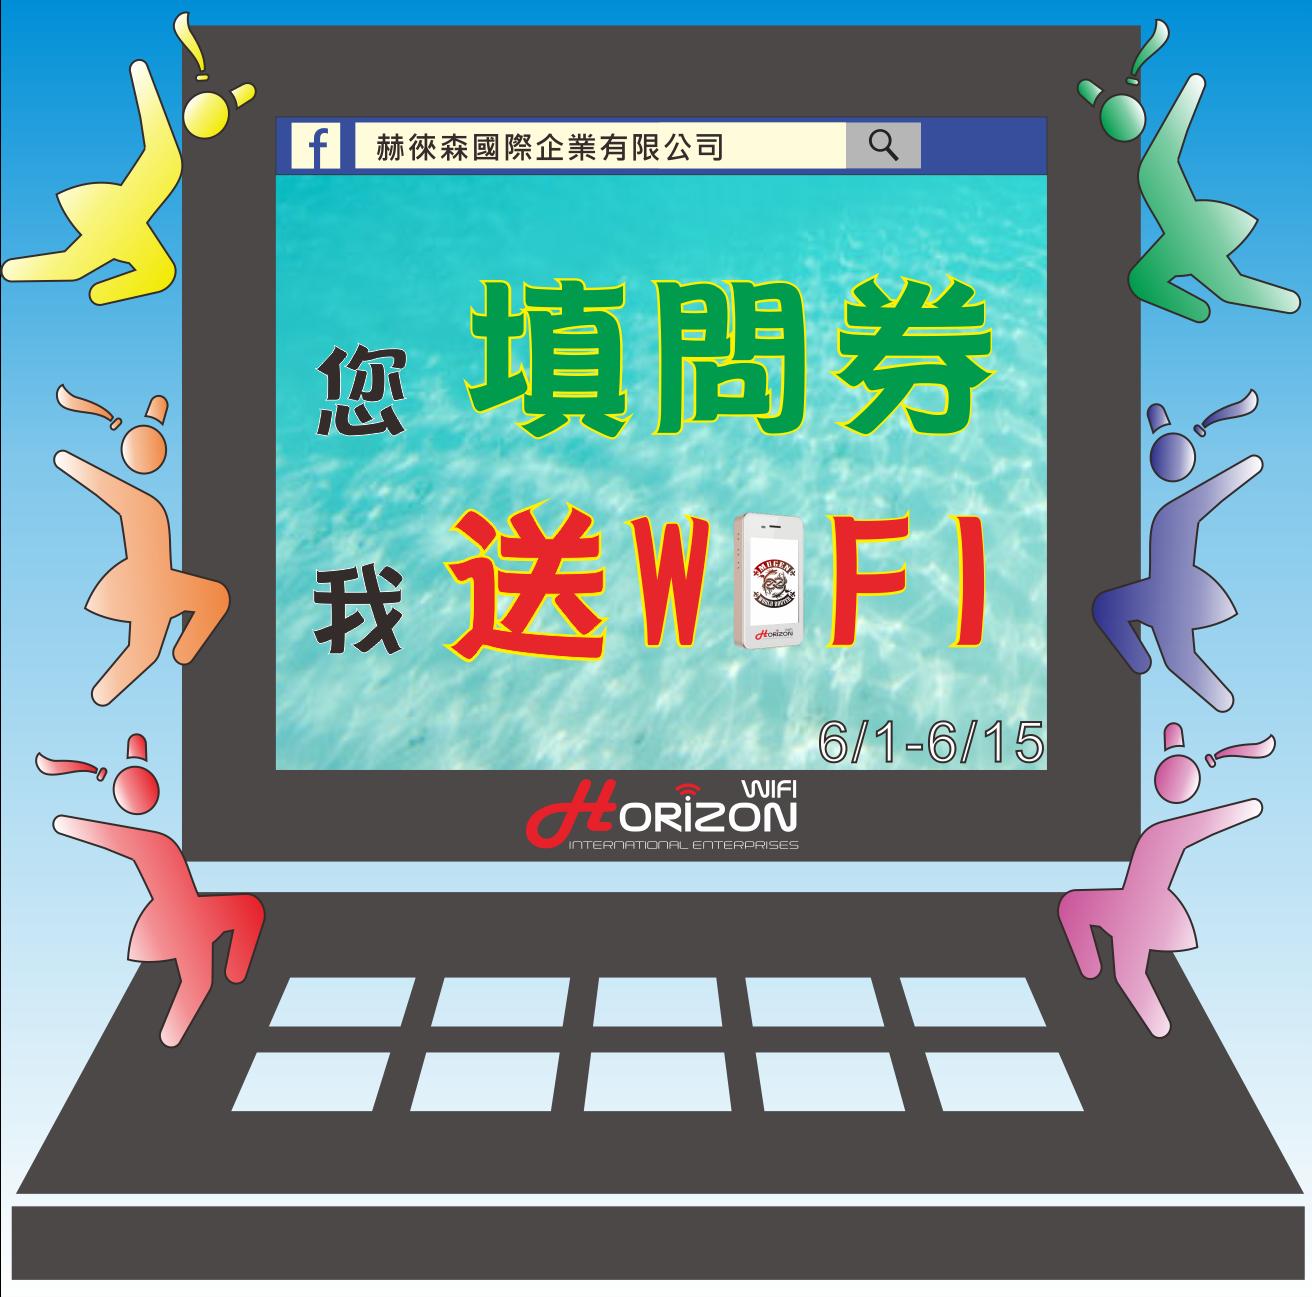 Horizon-WiFi 填問券送WiFi